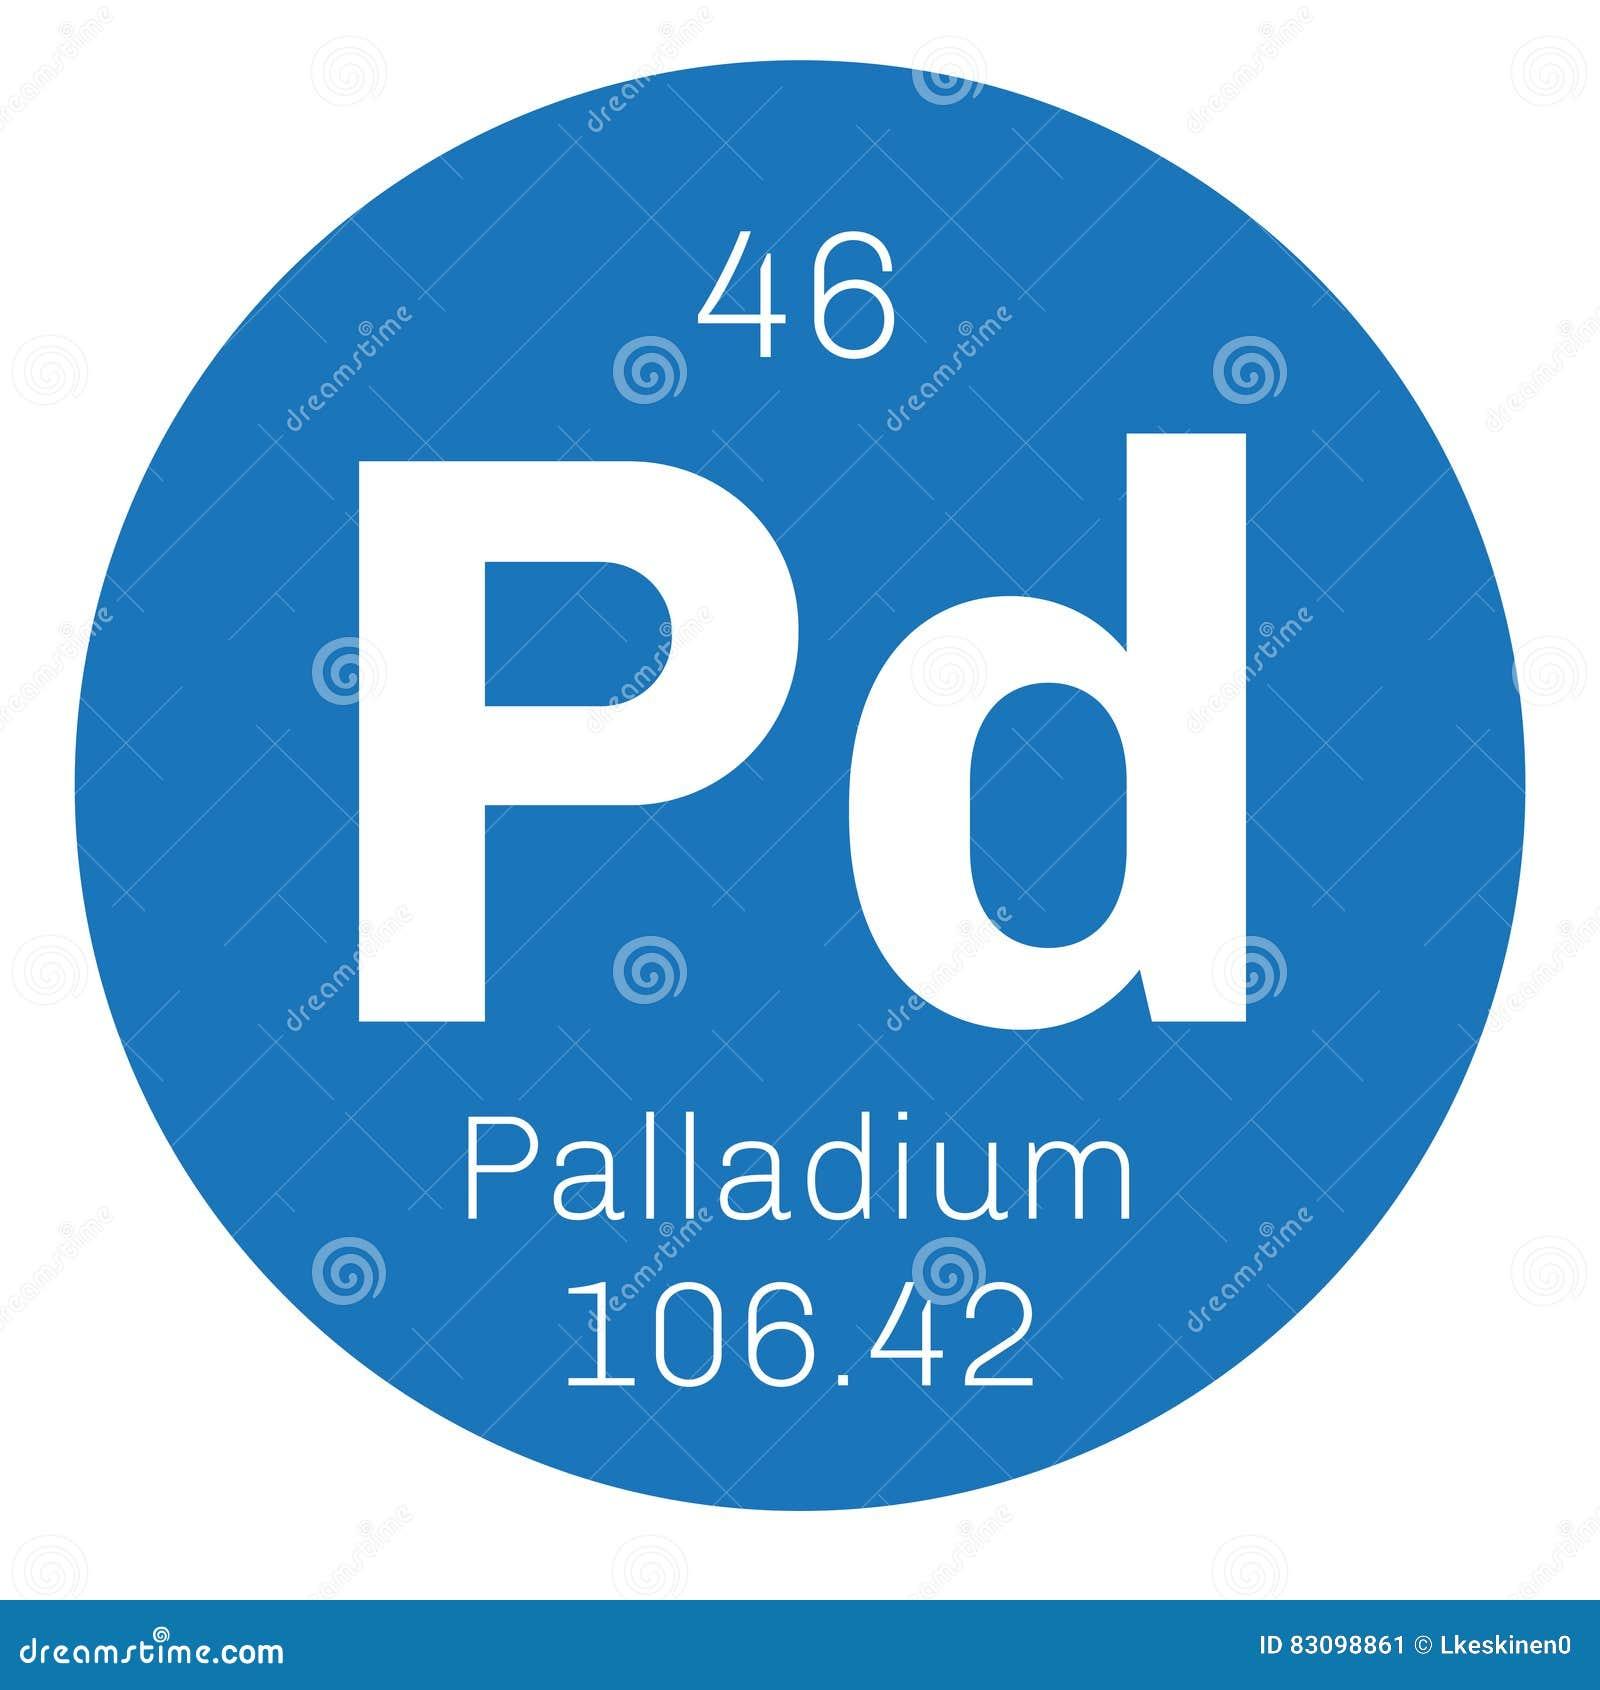 Palladium Chemical Element Stock Vector Illustration Of Groups